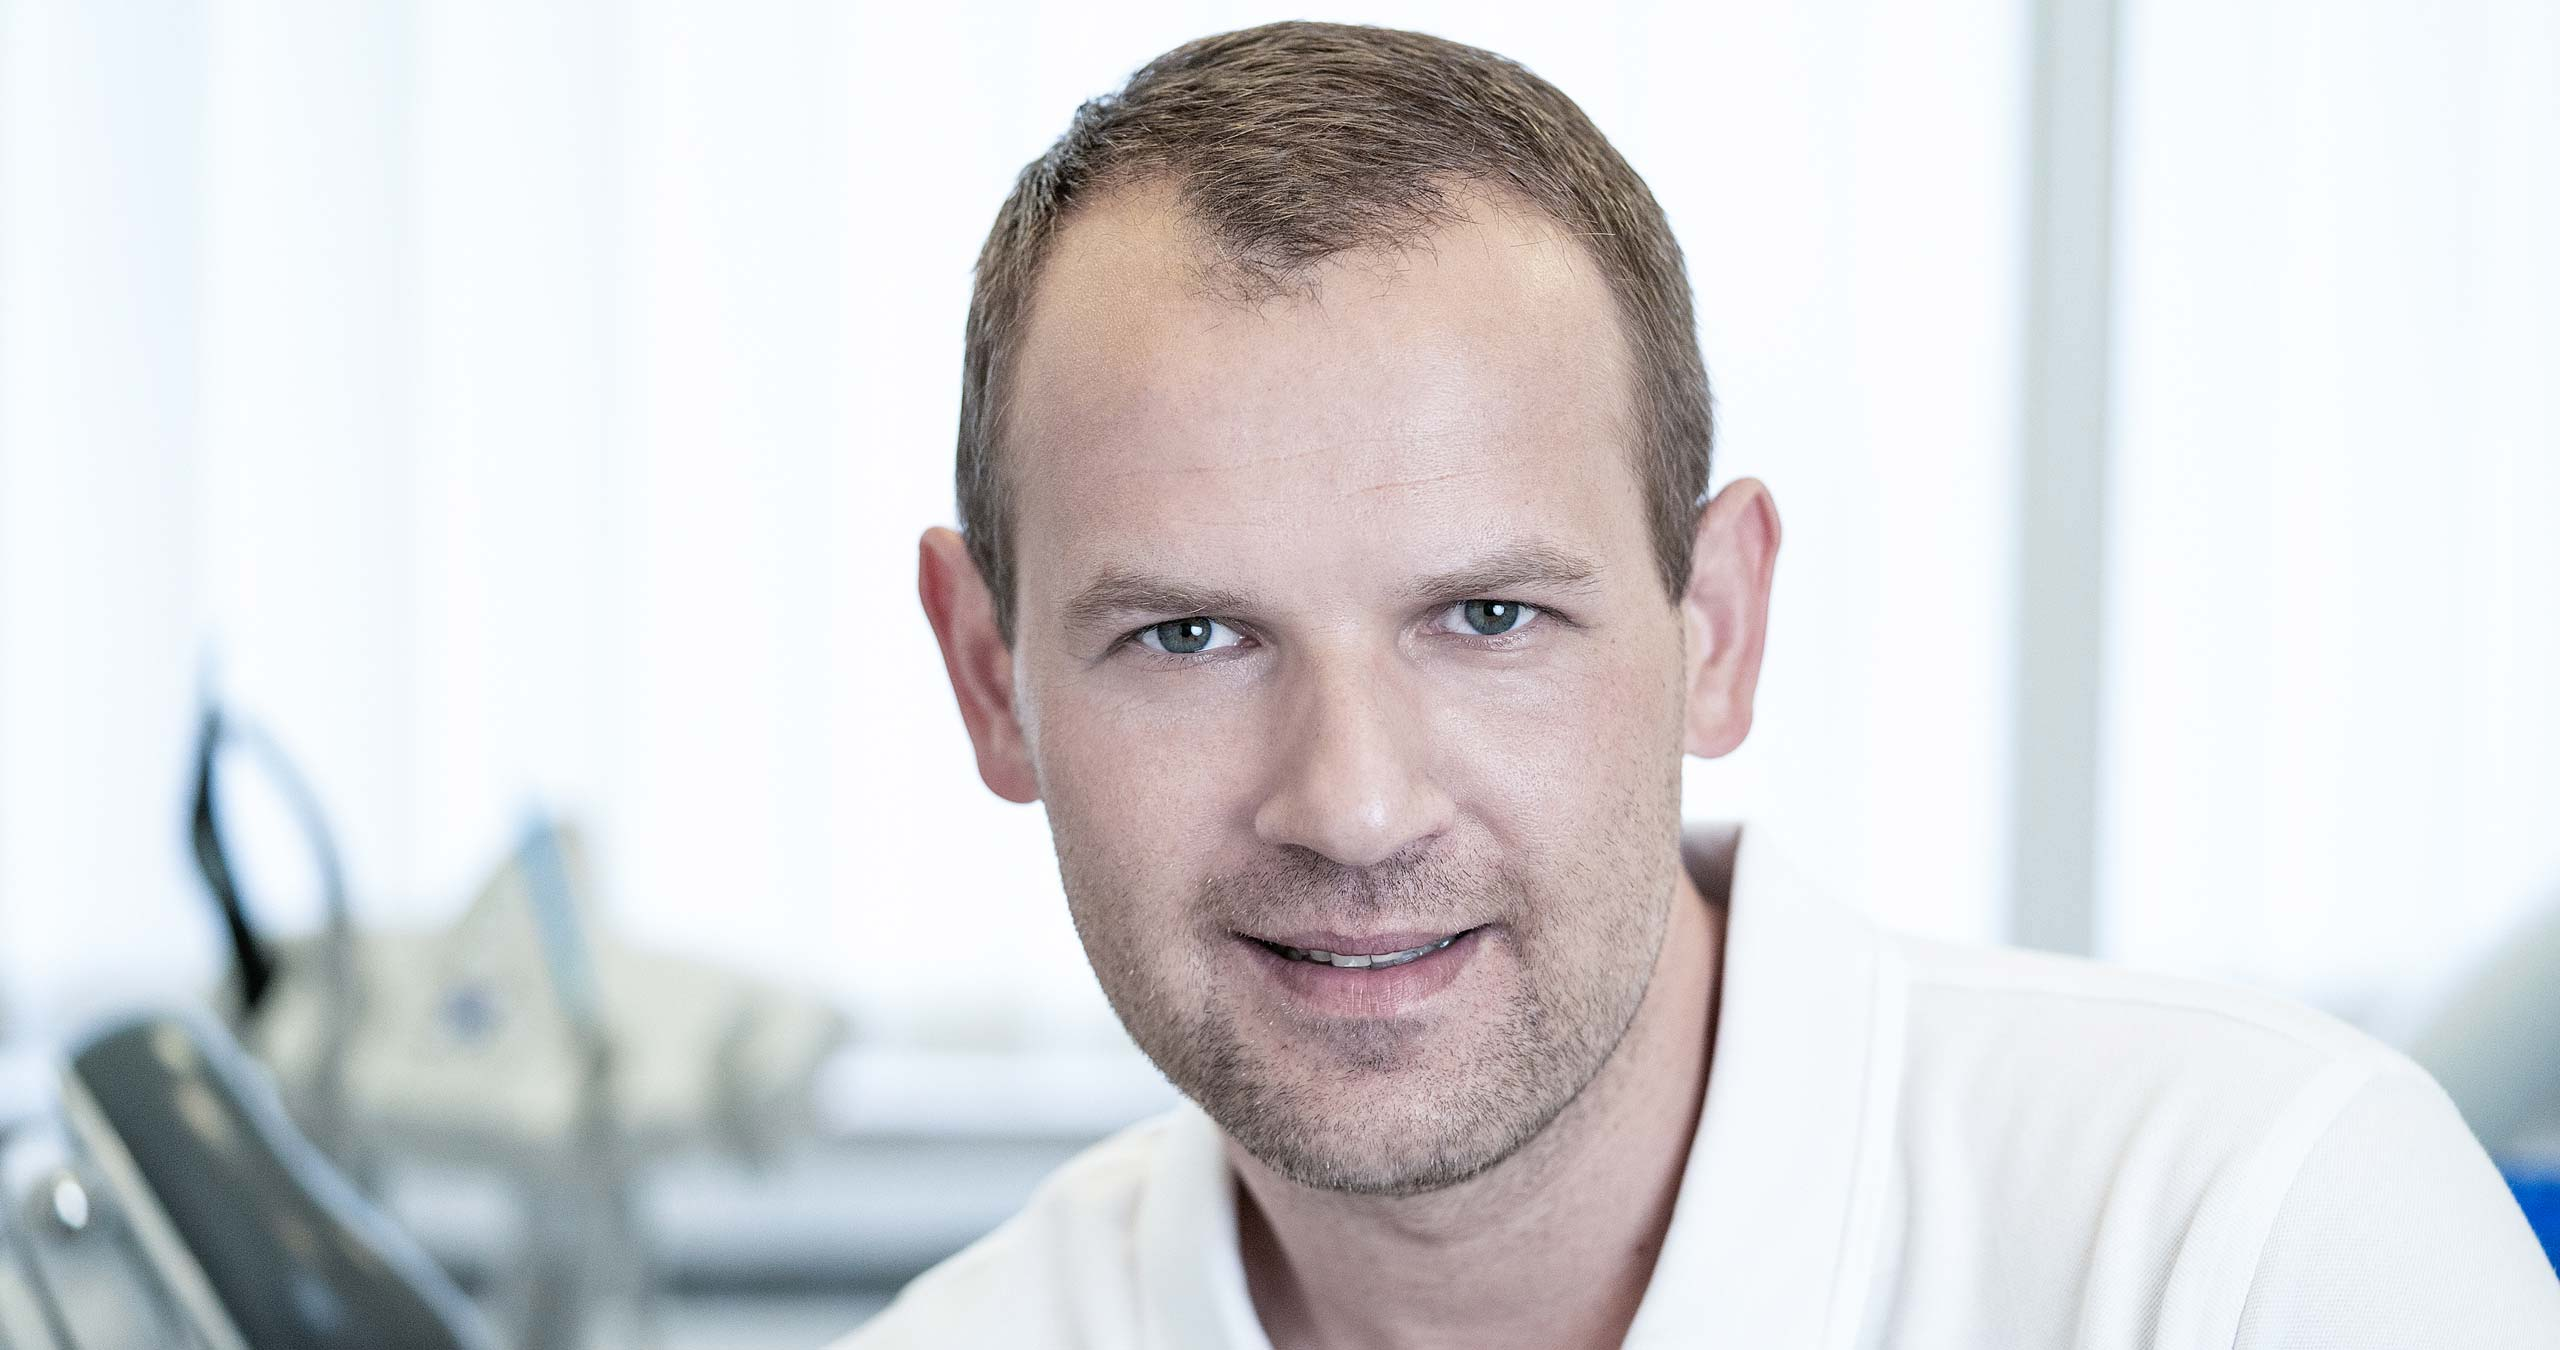 Dr. Thiesbrummel Bielefeld